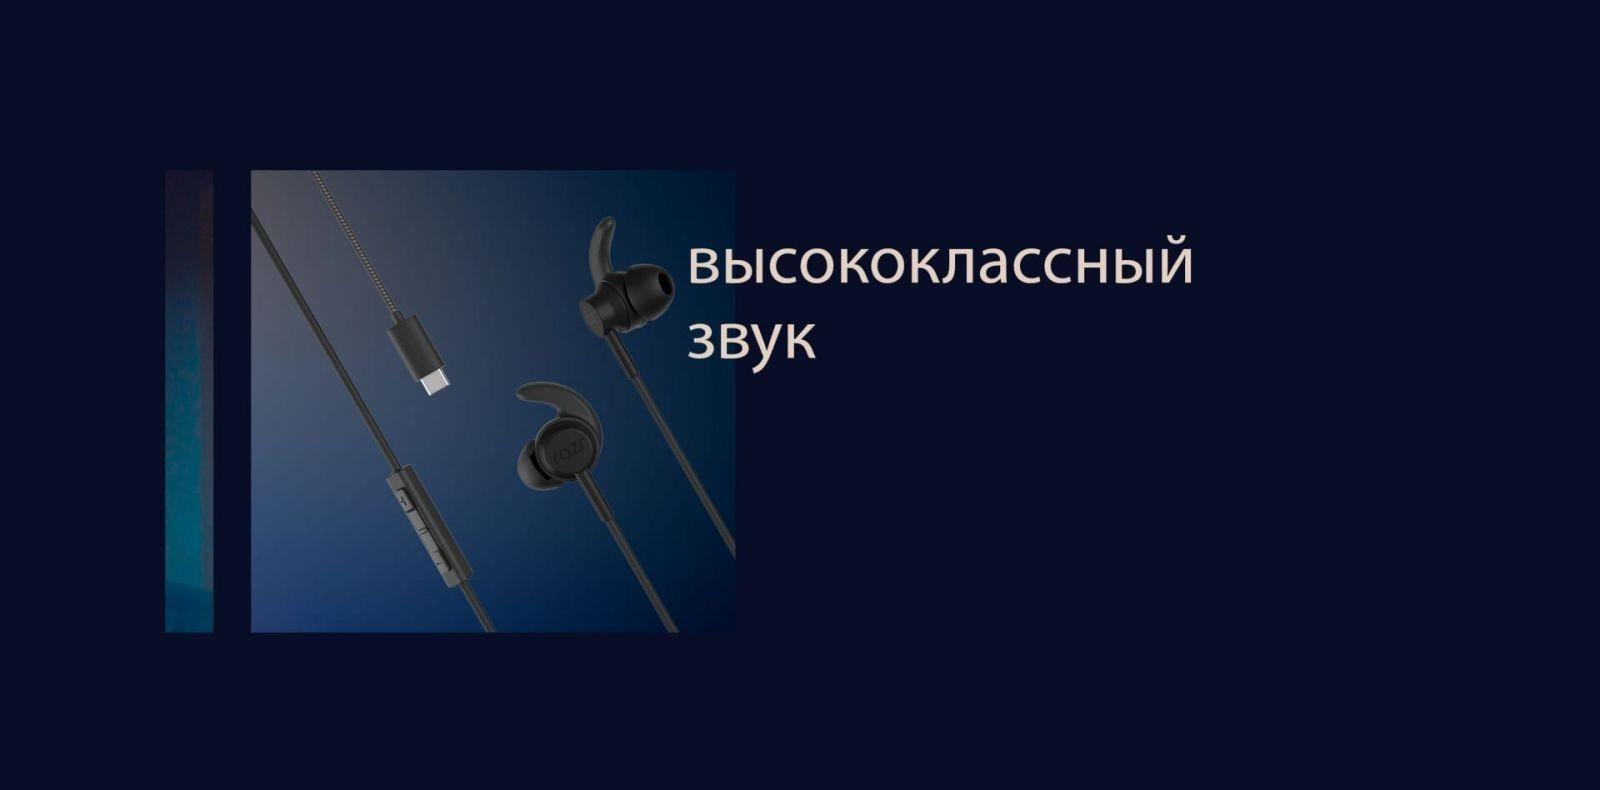 Motorola представила смартфон-раскладушку Motorola Razr (razr pdp fullbleedhalf audio ru d)